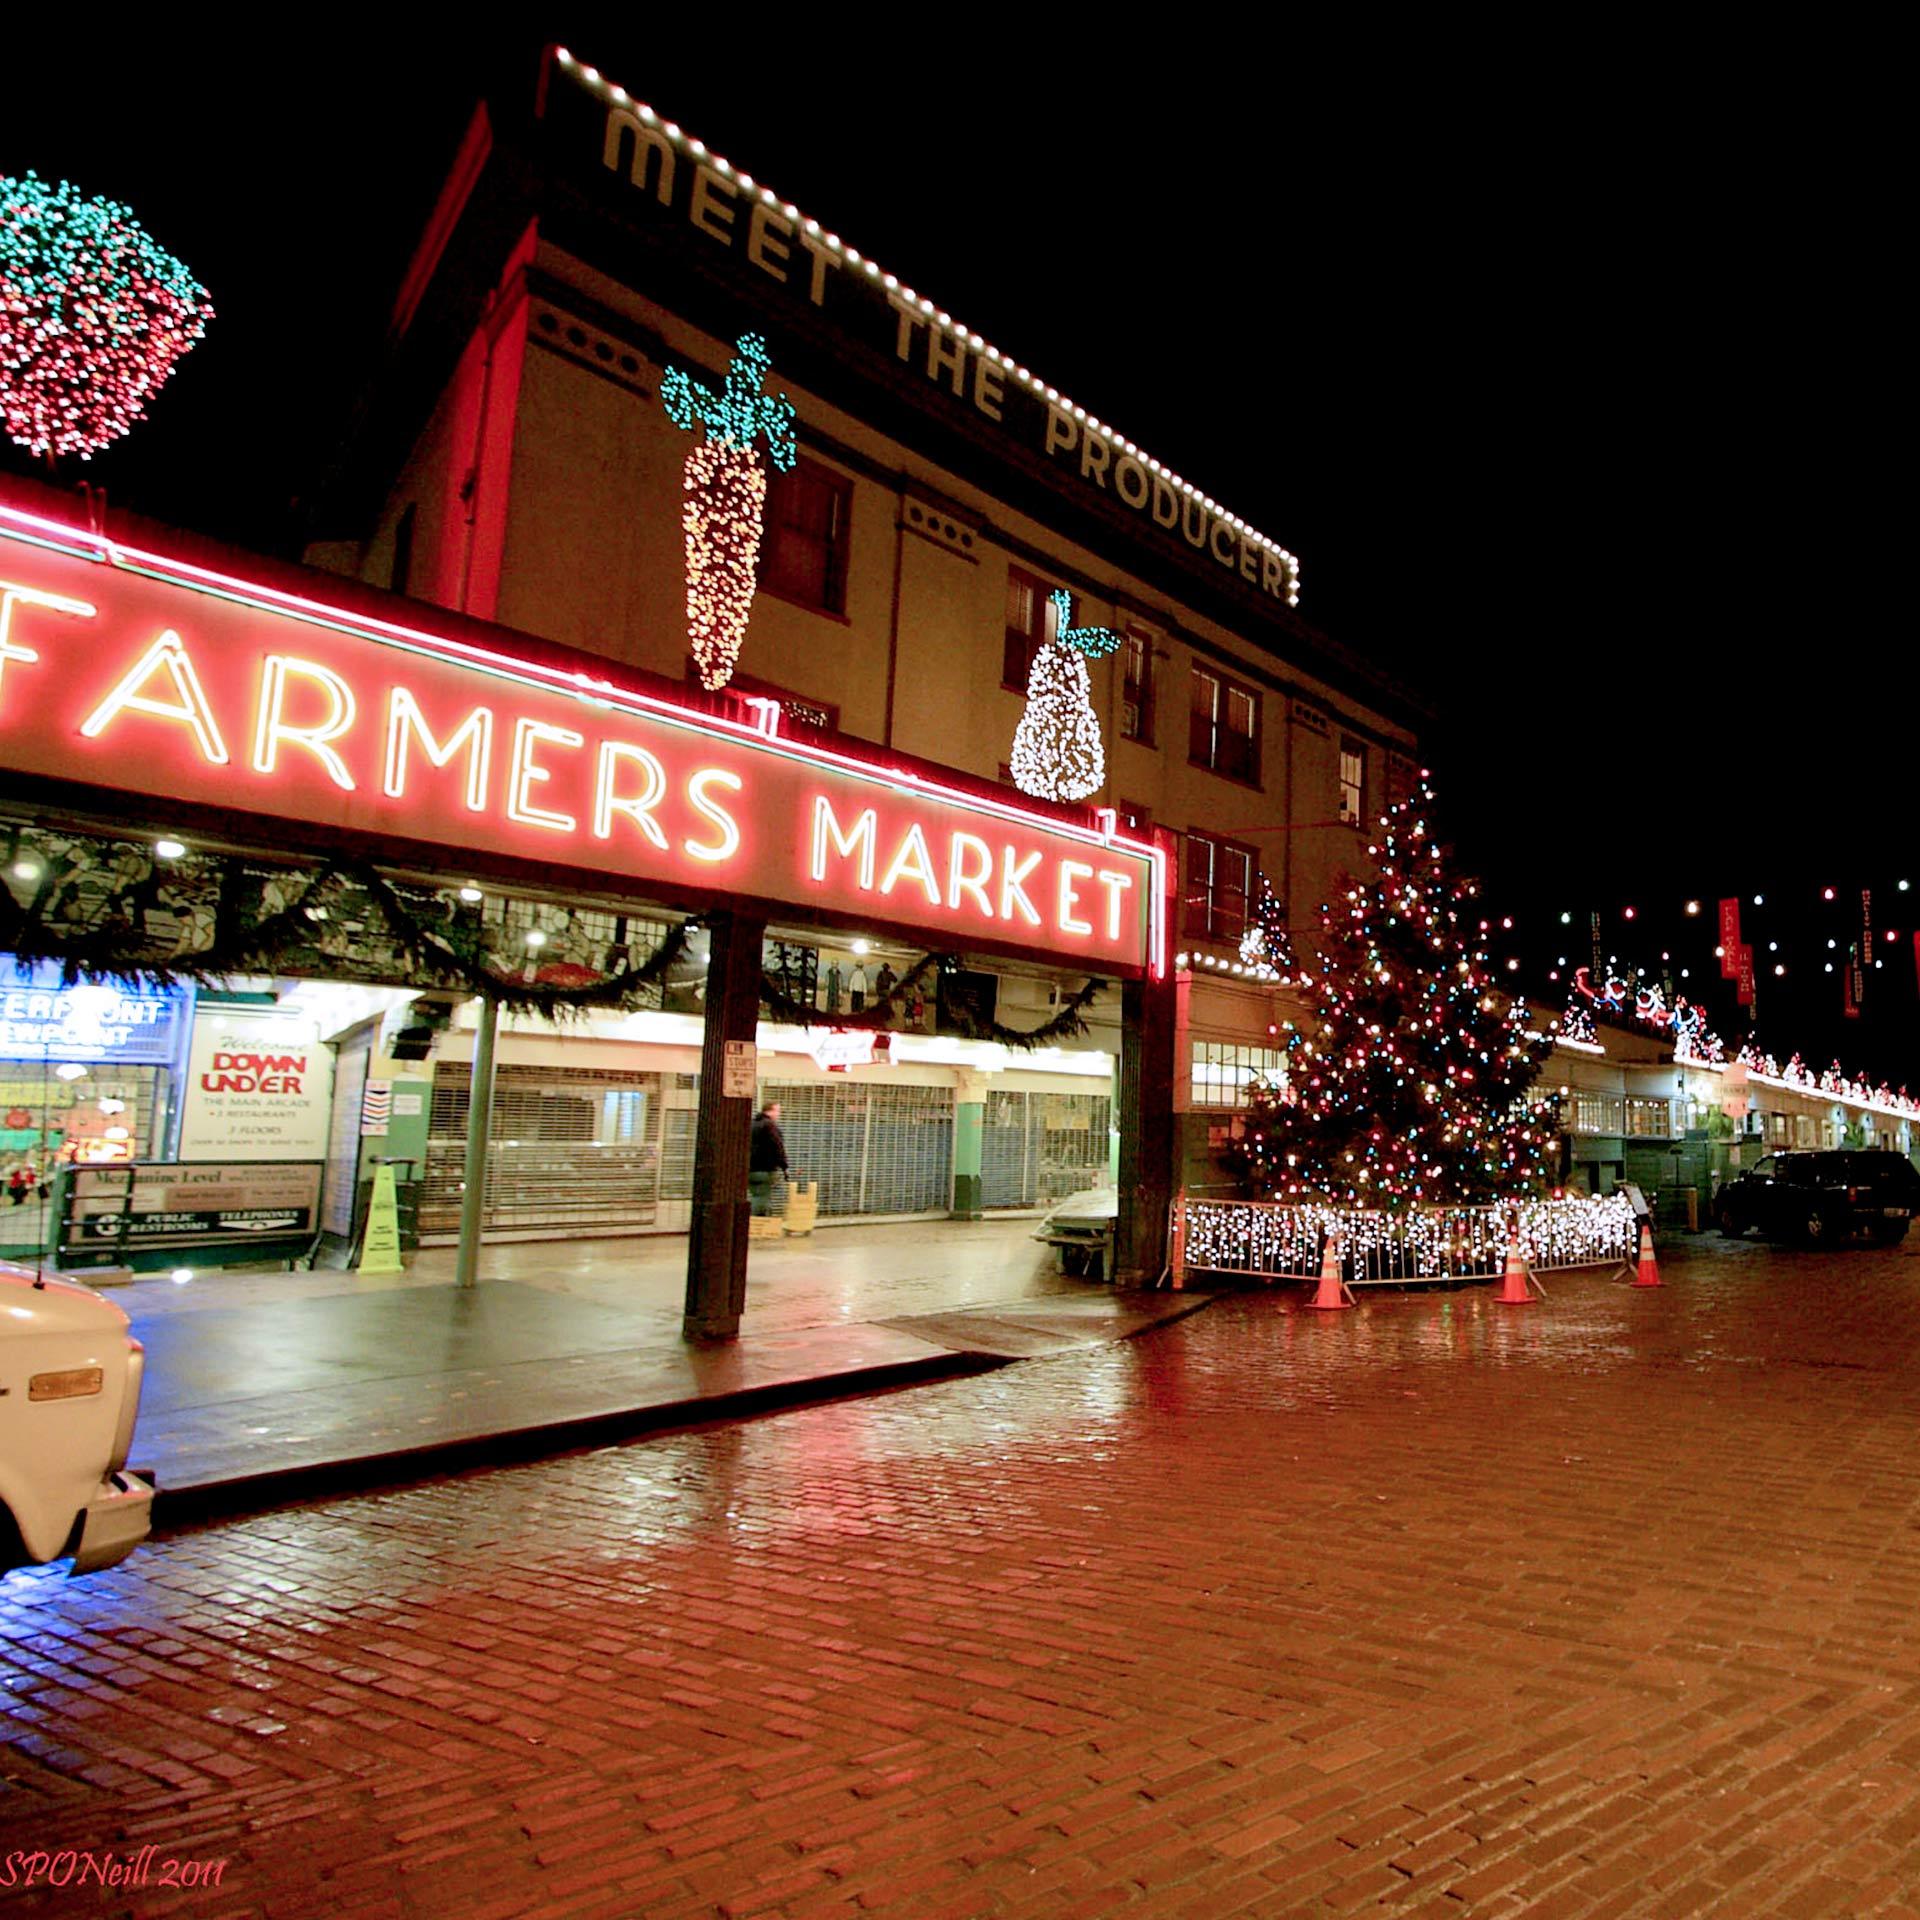 Neon farmers market sign